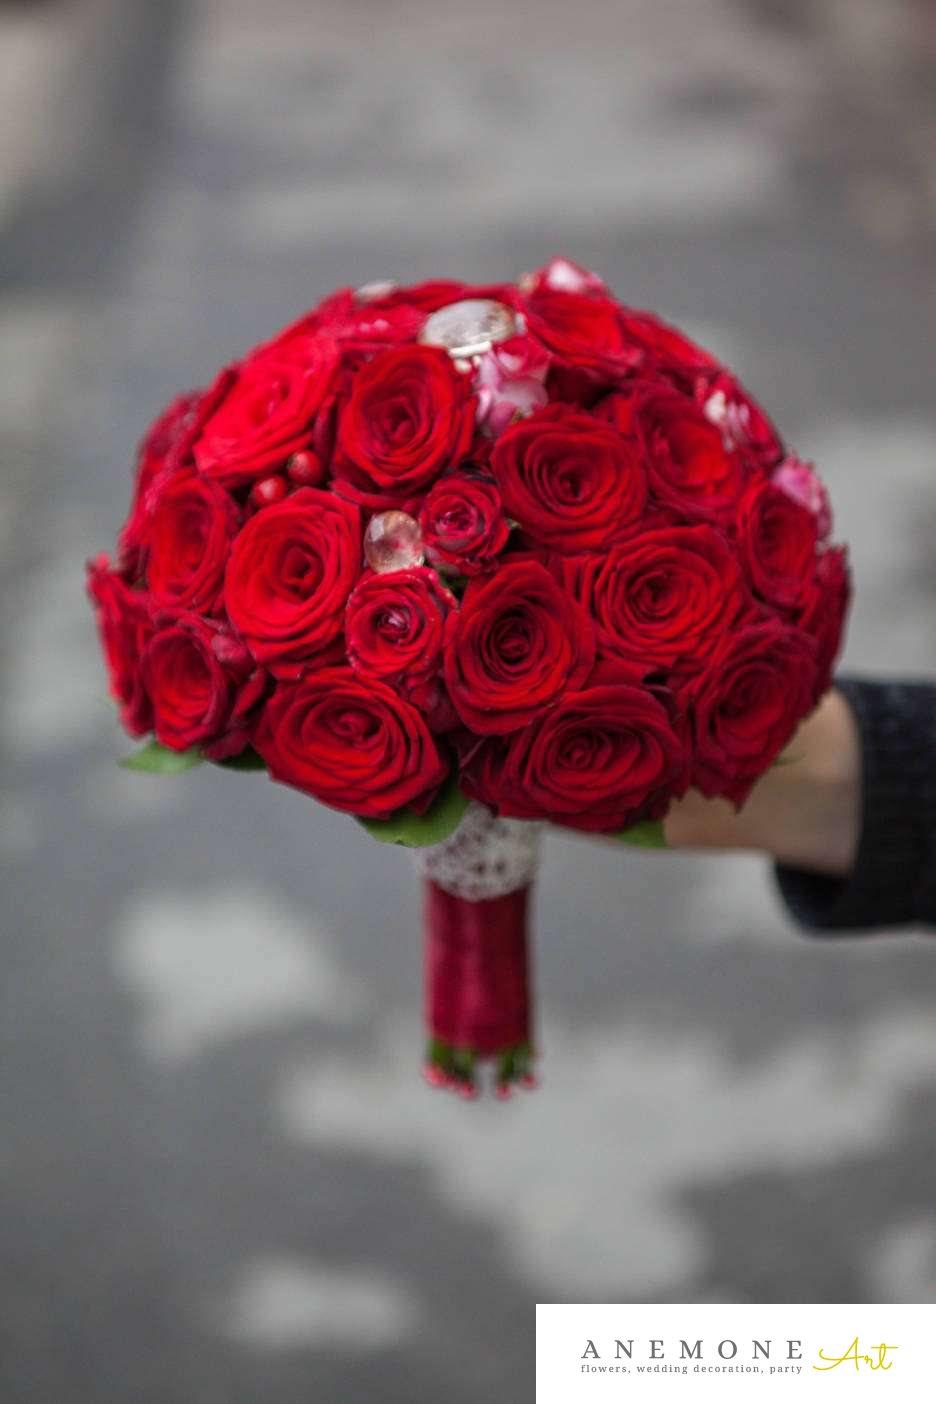 Poza, foto cu Flori de nunta buchet mireasa, cristale, rosu, rotund, trandafiri in Arad, Timisoara, Oradea (wedding flowers, bouquets) nunta Arad, Timisoara, Oradea